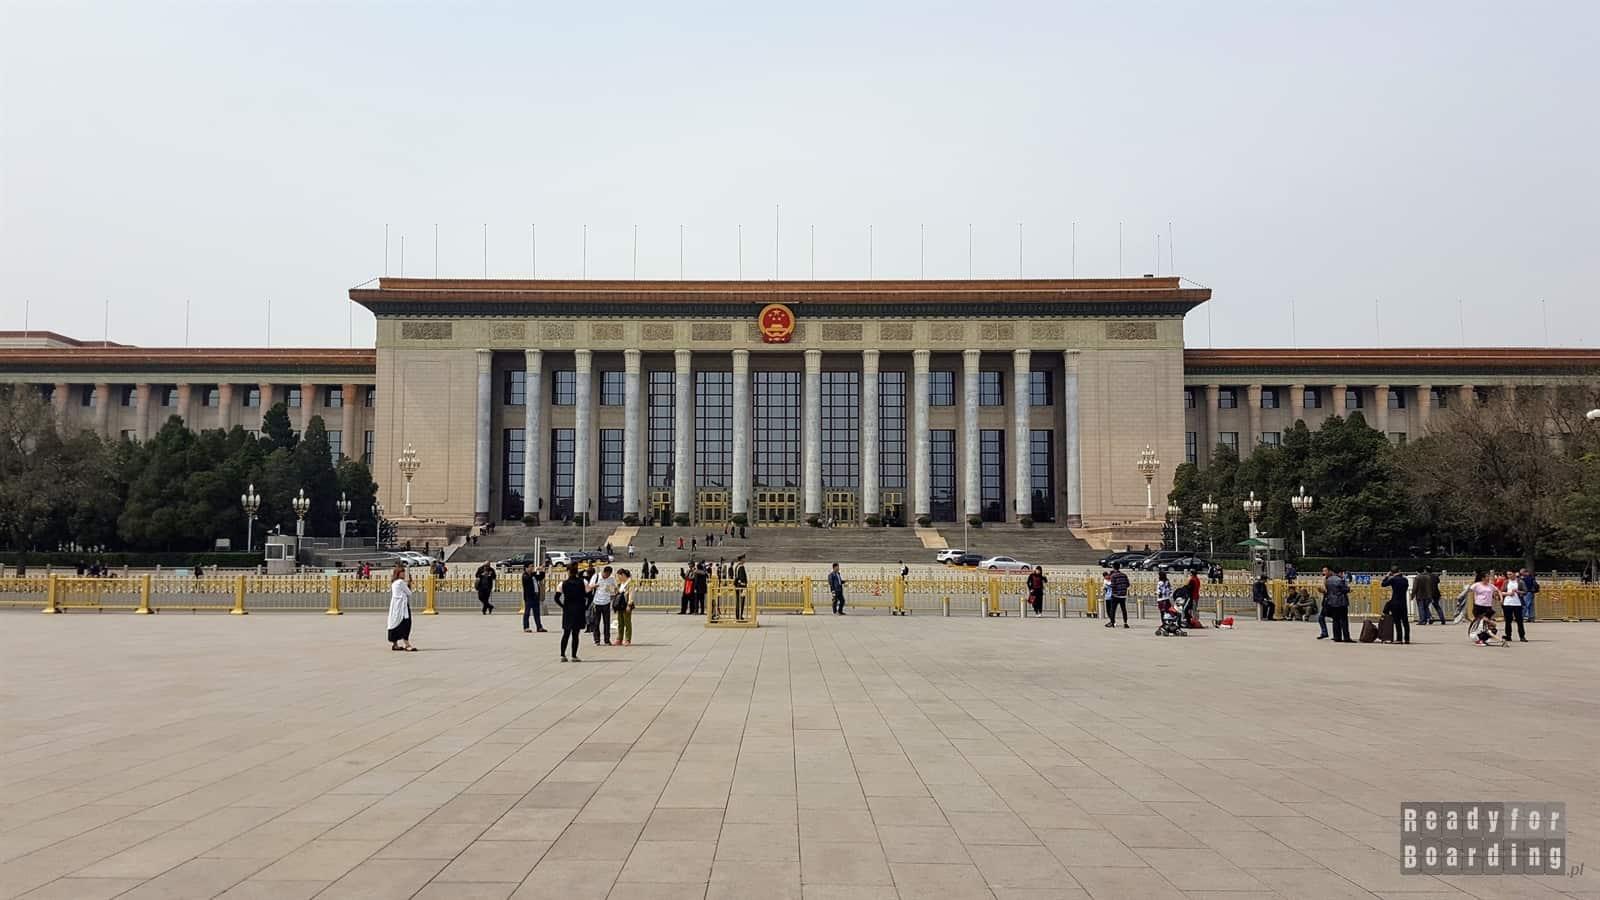 Pekin - Plac Tian'anmen i Park Beihai (galeria zdjęć)